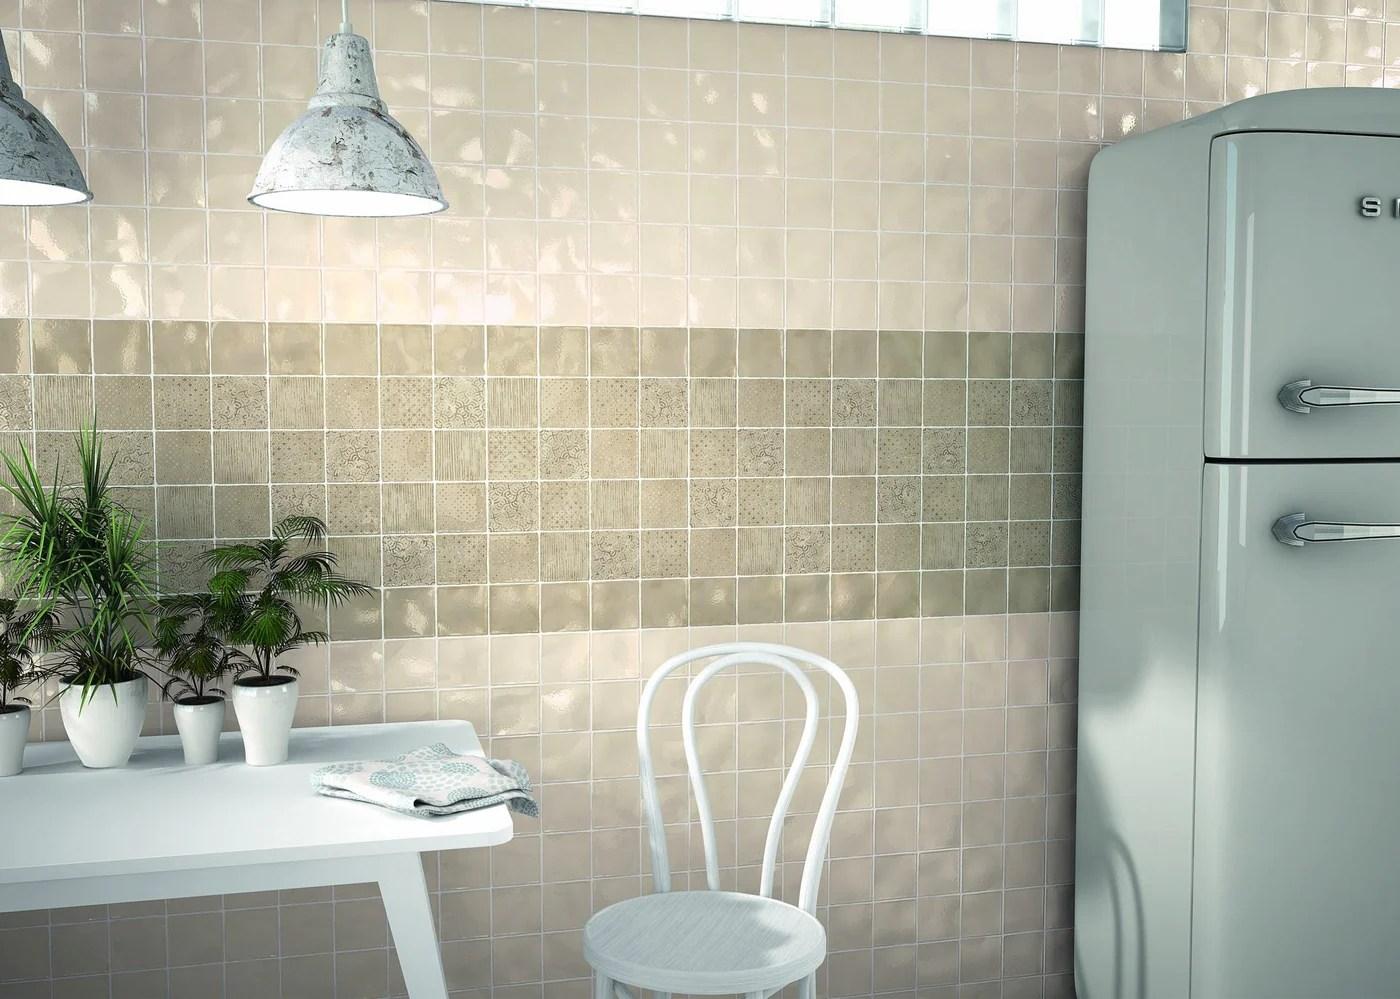 04stow04 bia 4x4 ceramic tile